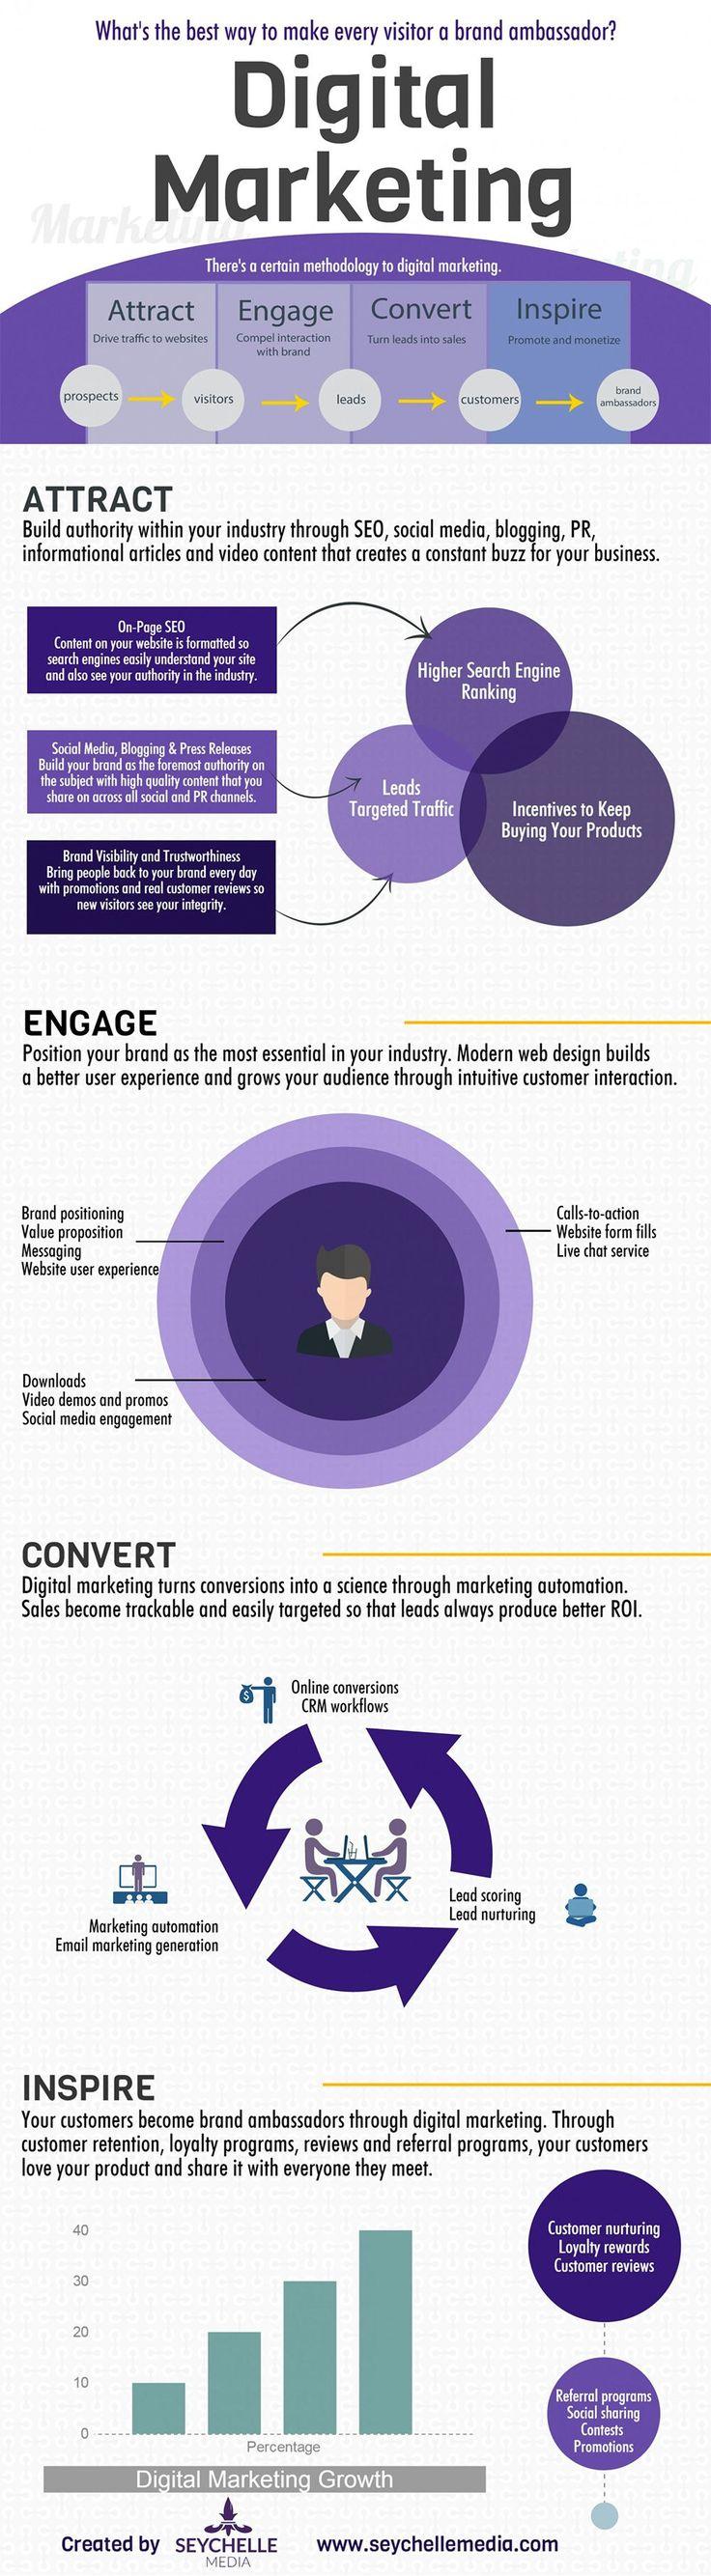 4 Basic Steps to Turn Web Visitors Into Brand Ambassadors (Infographic) #SEODigitalMarketing